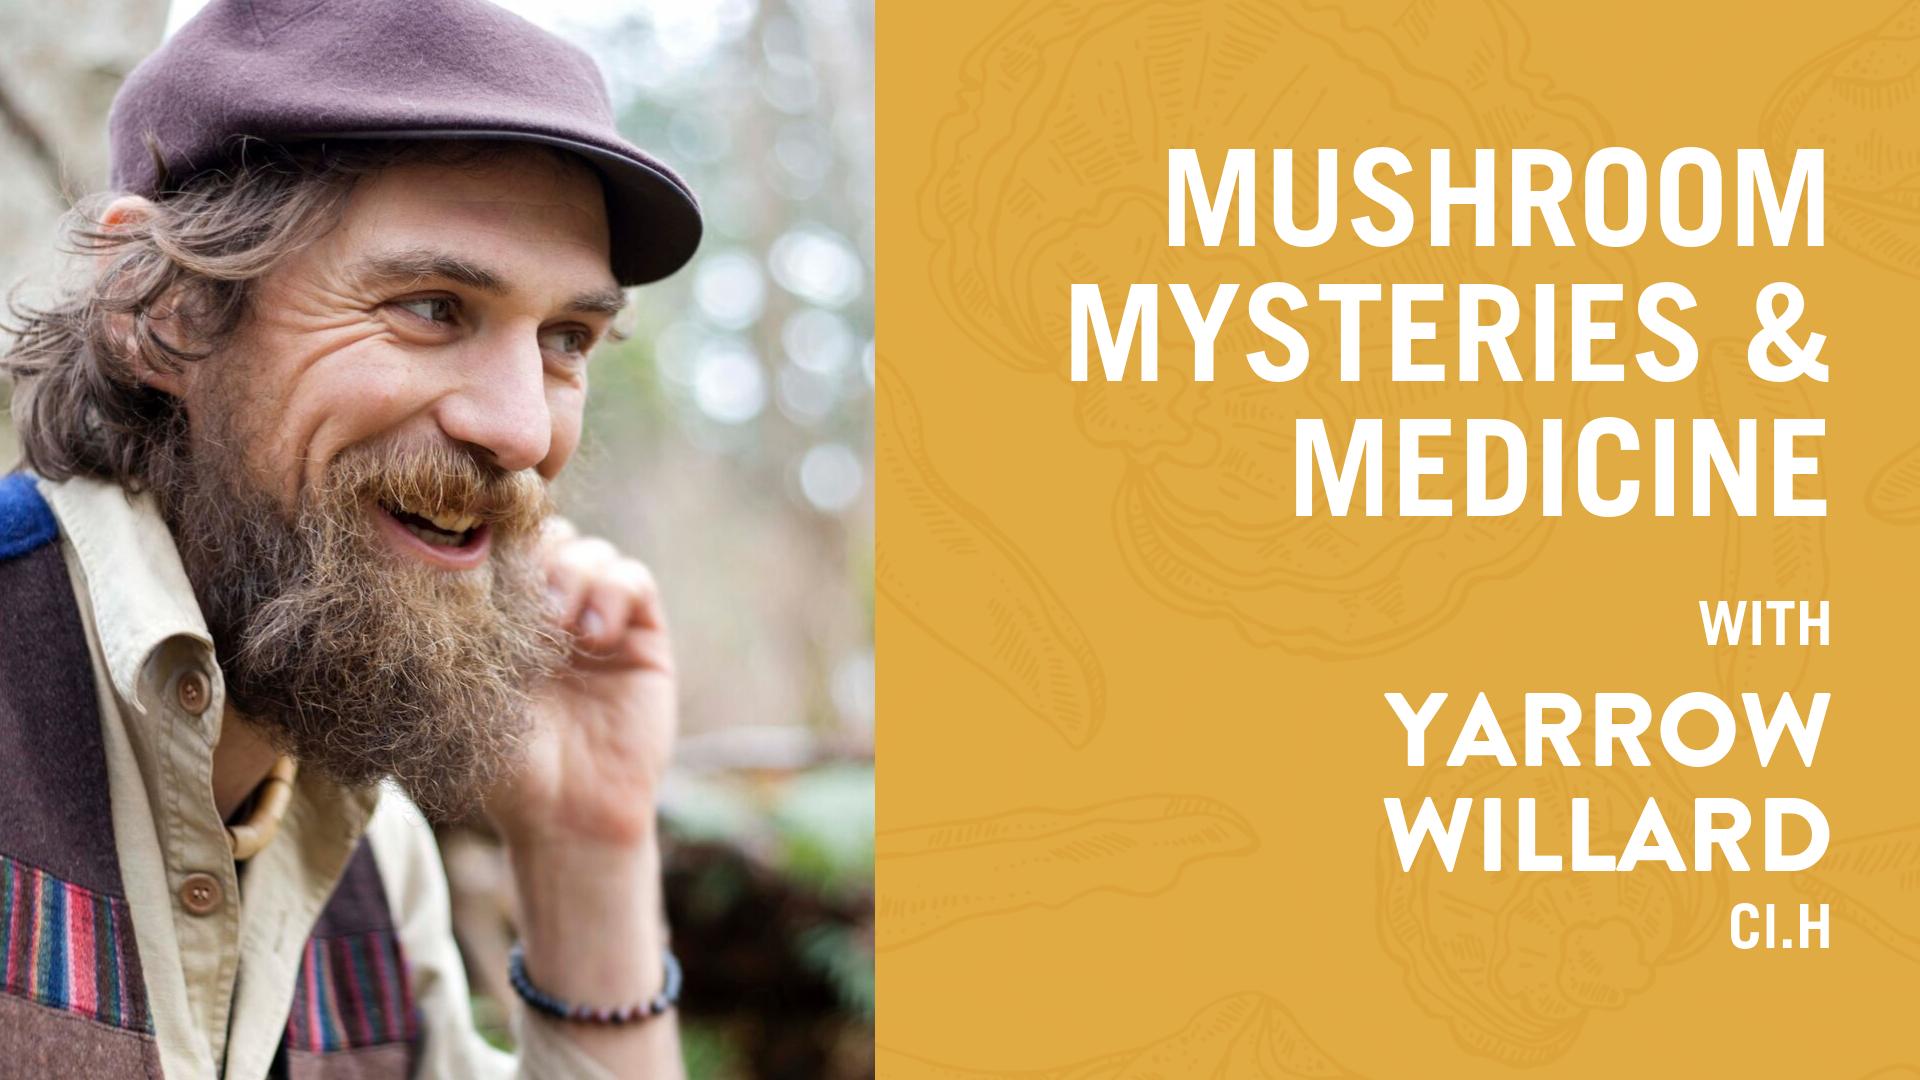 Mushroom_Talk_Facebook_Event_Cover.png